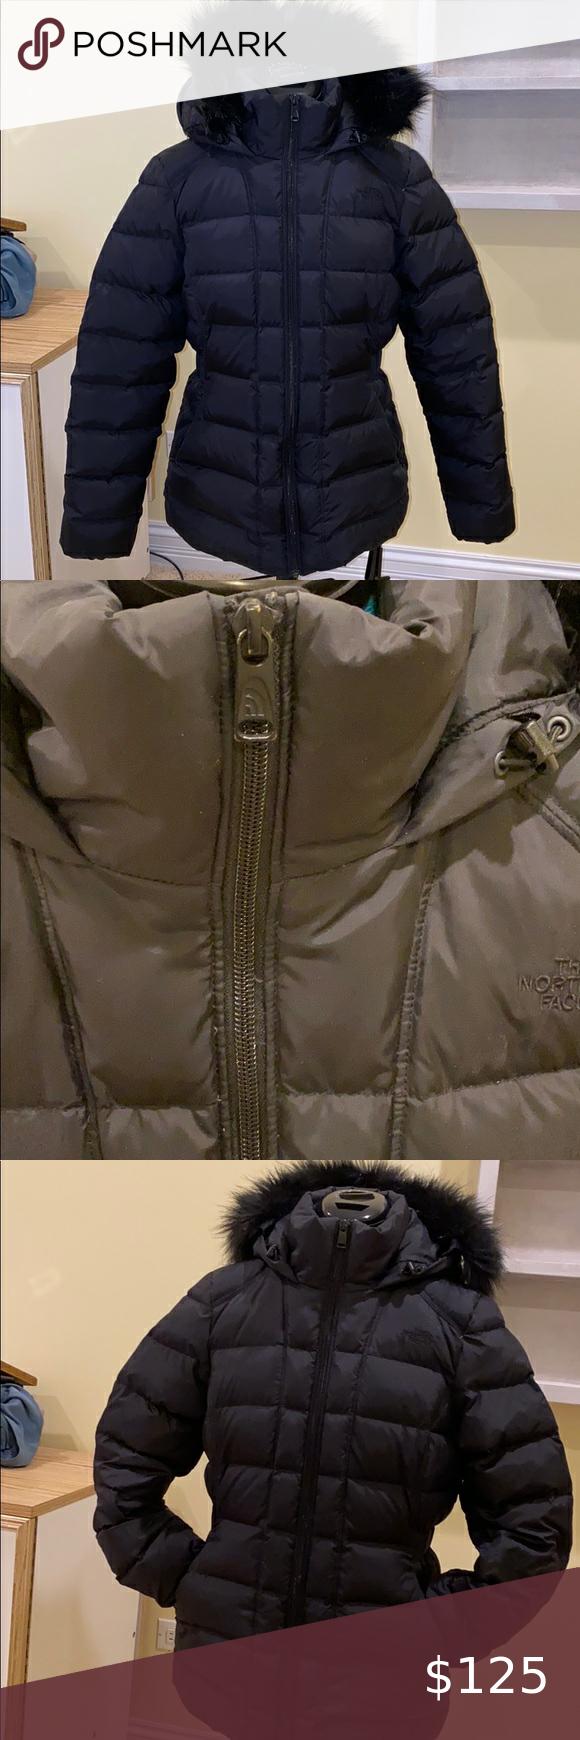 Woman S North Face Gotham Jacket Black Winter Jacket Black North Face Jackets [ 1740 x 580 Pixel ]